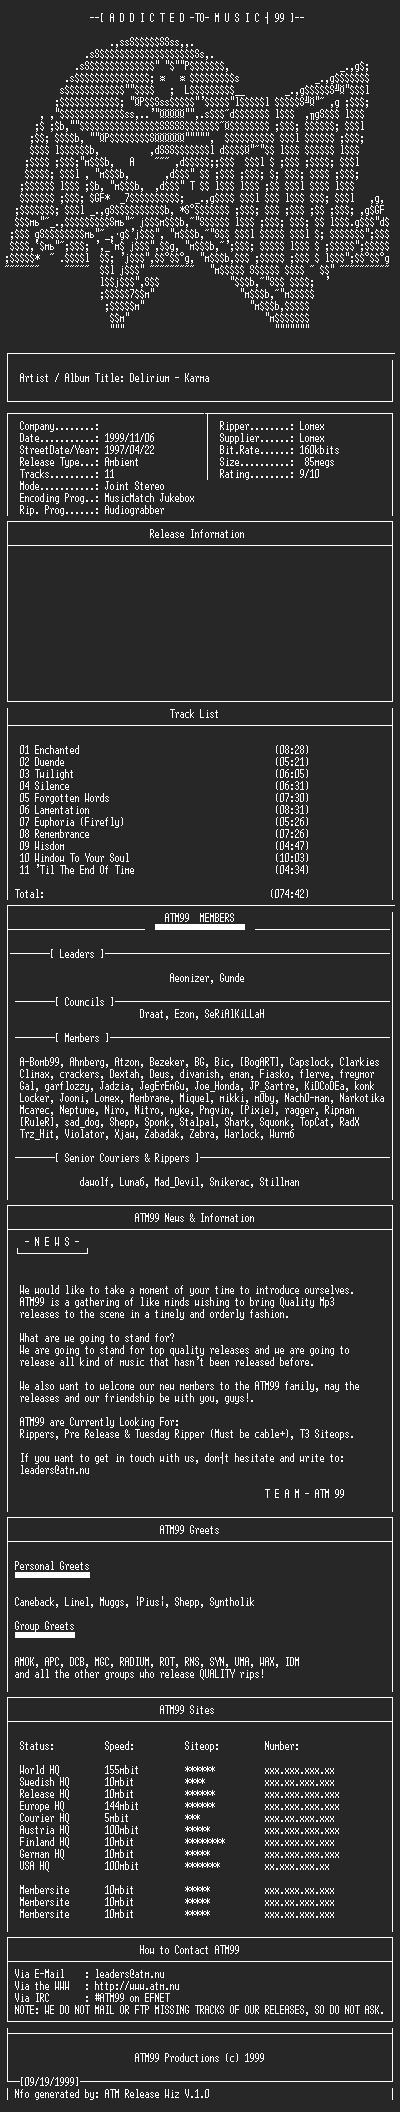 NFO file for Delirium_-_Karma_-_(1997)-ATM99